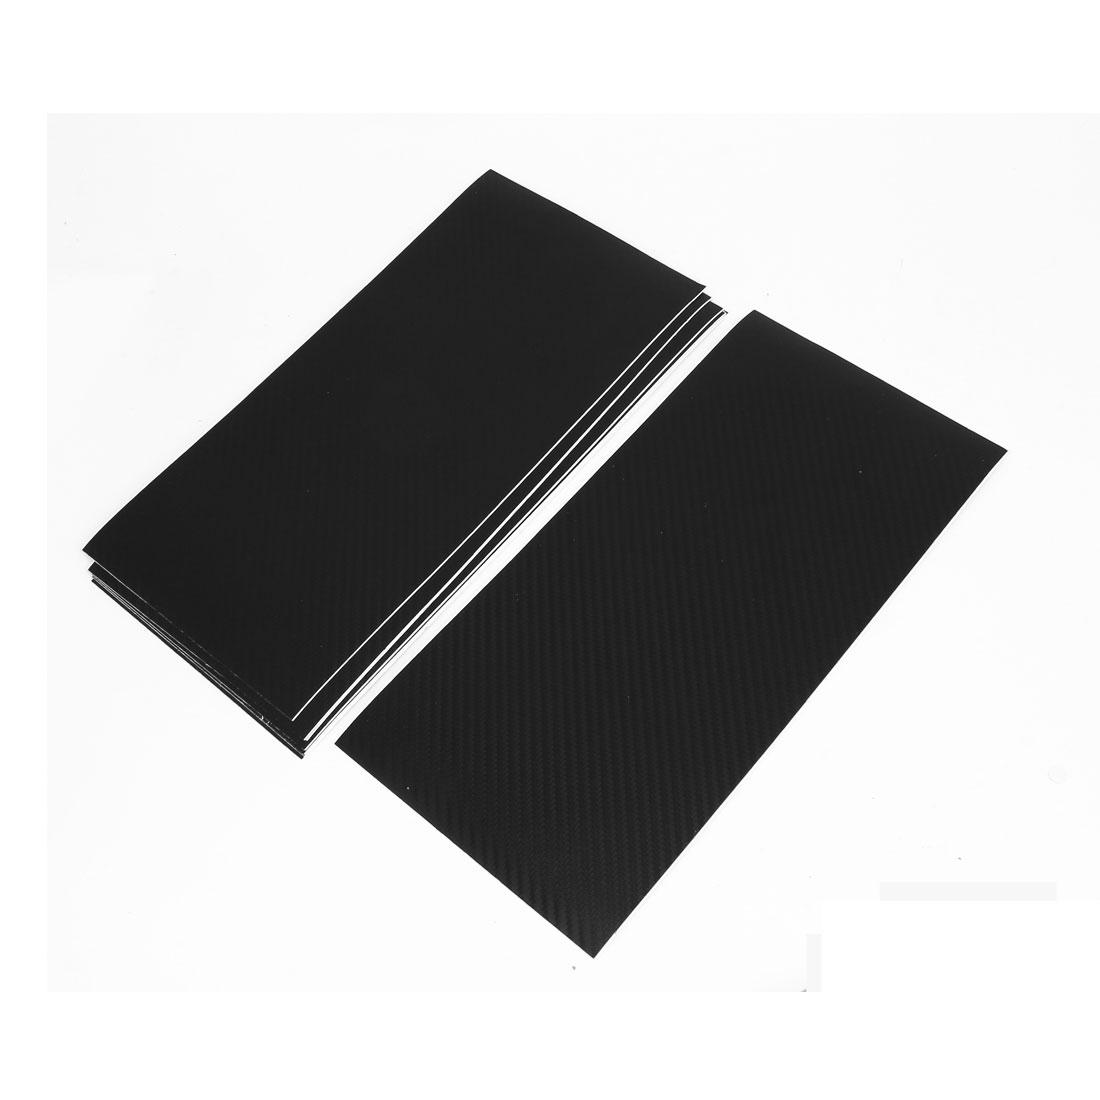 10pcs 300 x 143mm Self Adhesive Carbon Fiber Pattern Vinyl Protective Film Sticker Black for Car